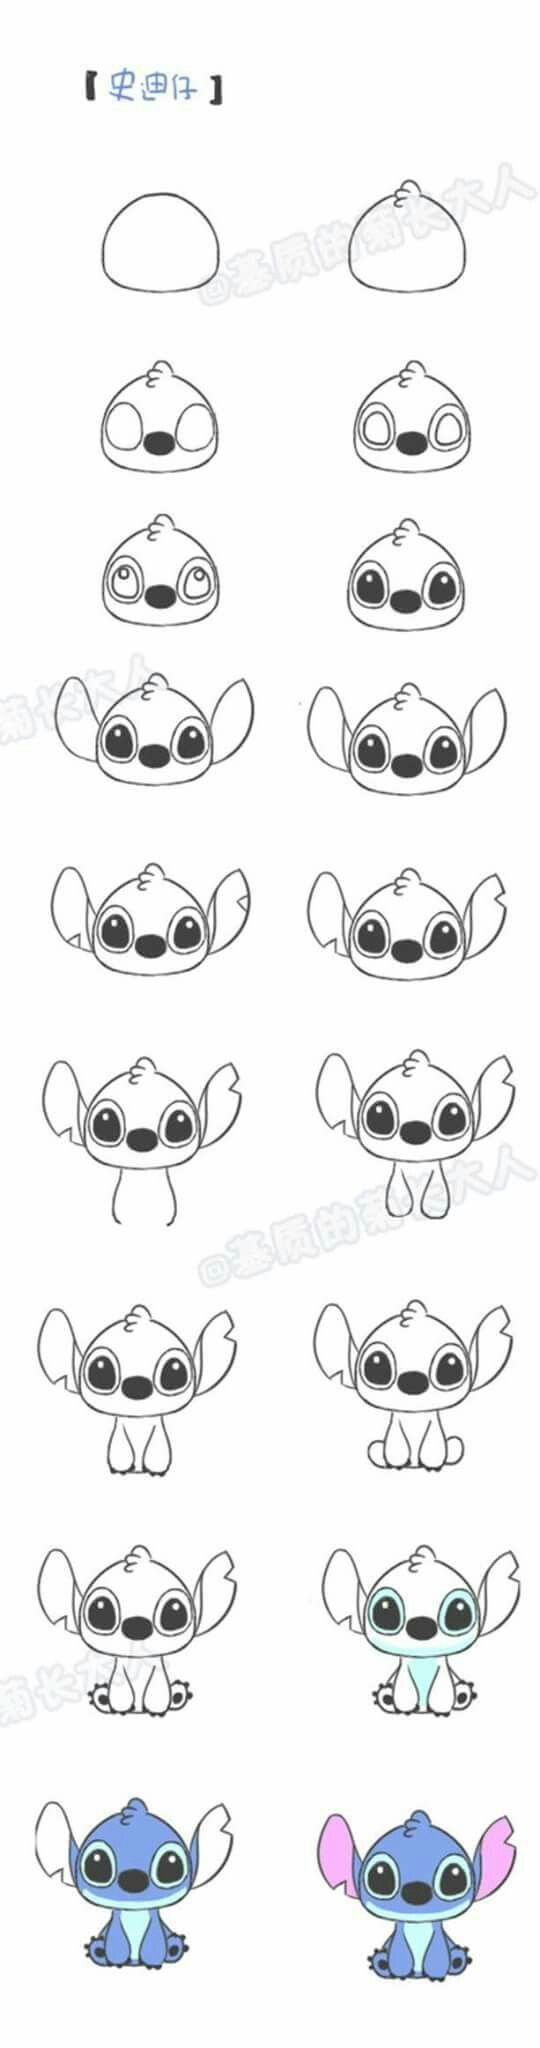 stitch drawing